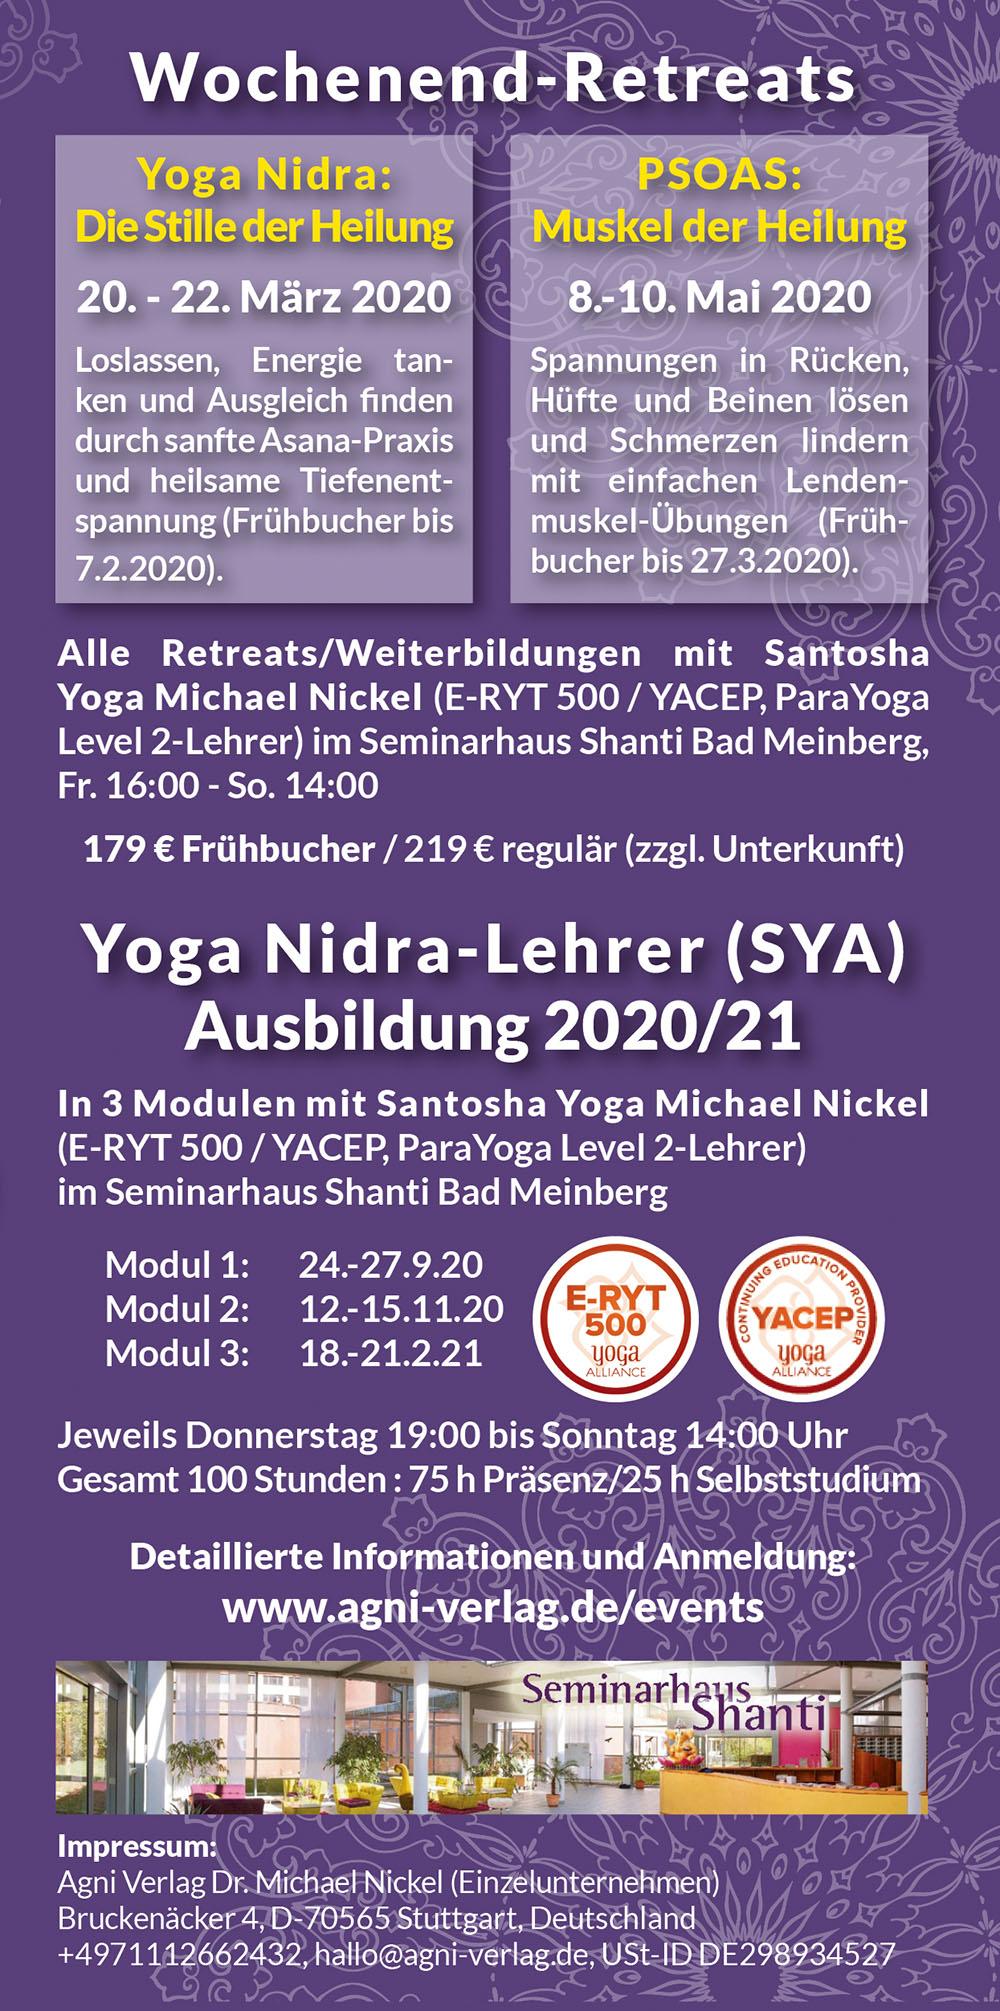 Agni Verlag Events Wochenend Retreat Yoga Nidra Lehrer Ausbildung 2020